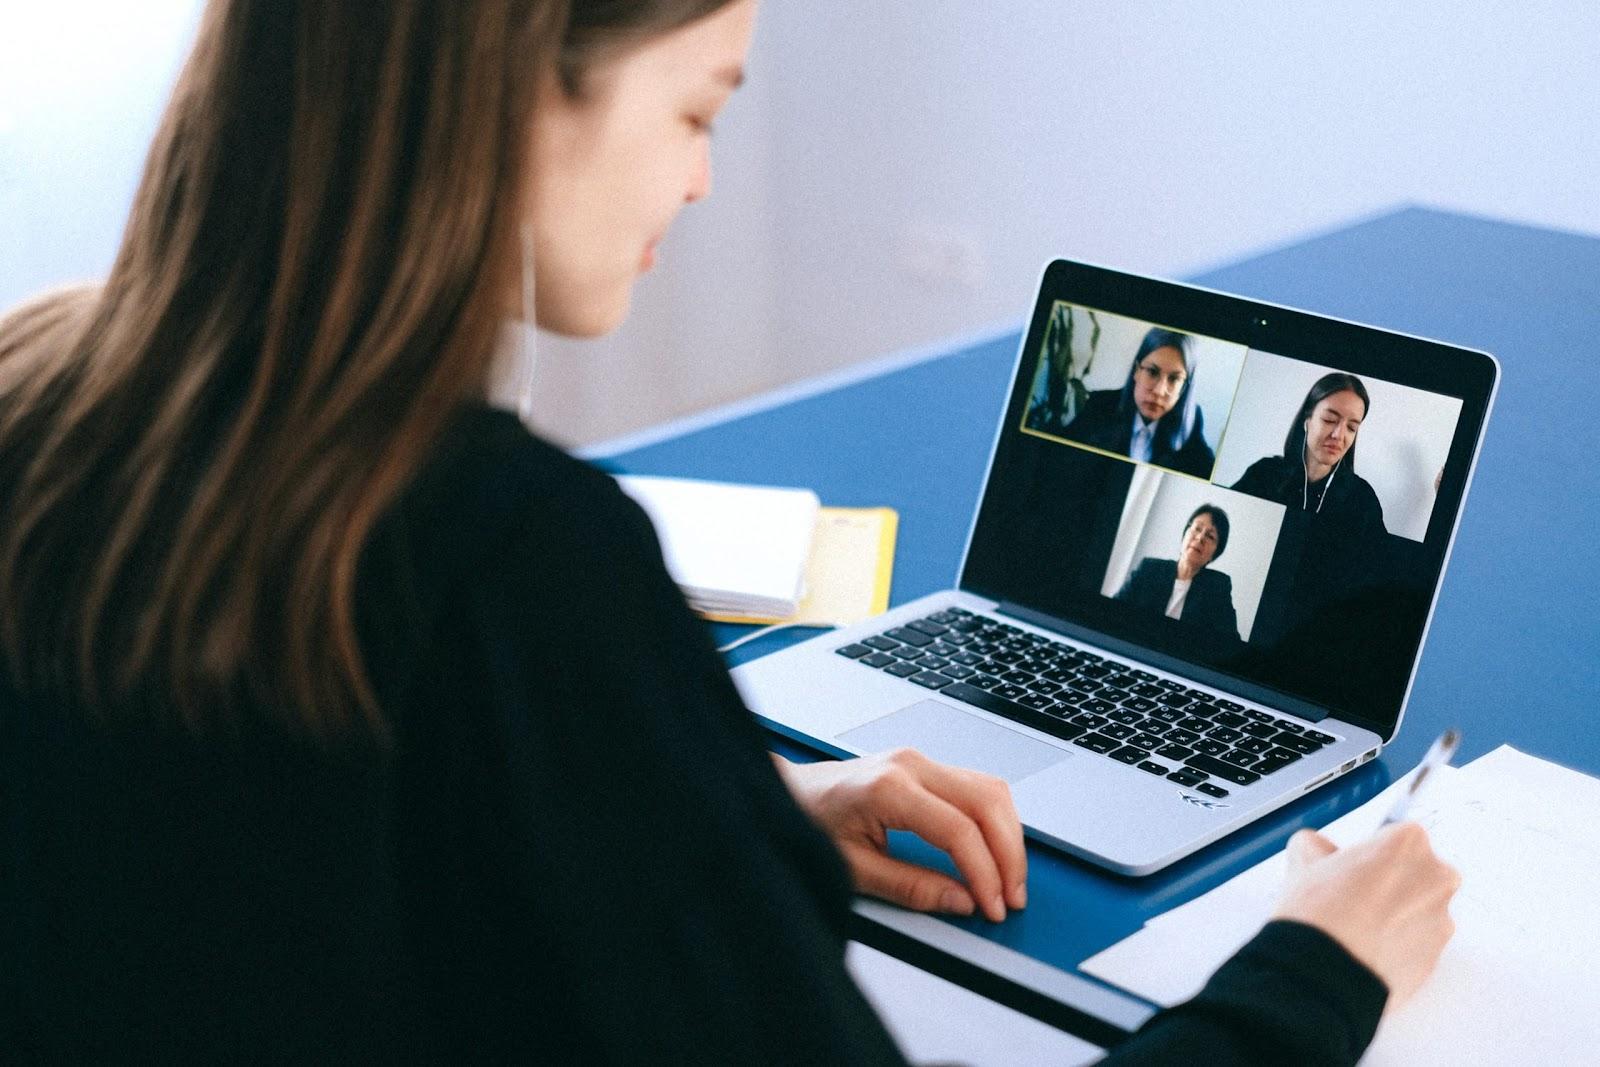 Sqft Digital - Zoom Meeting and Training